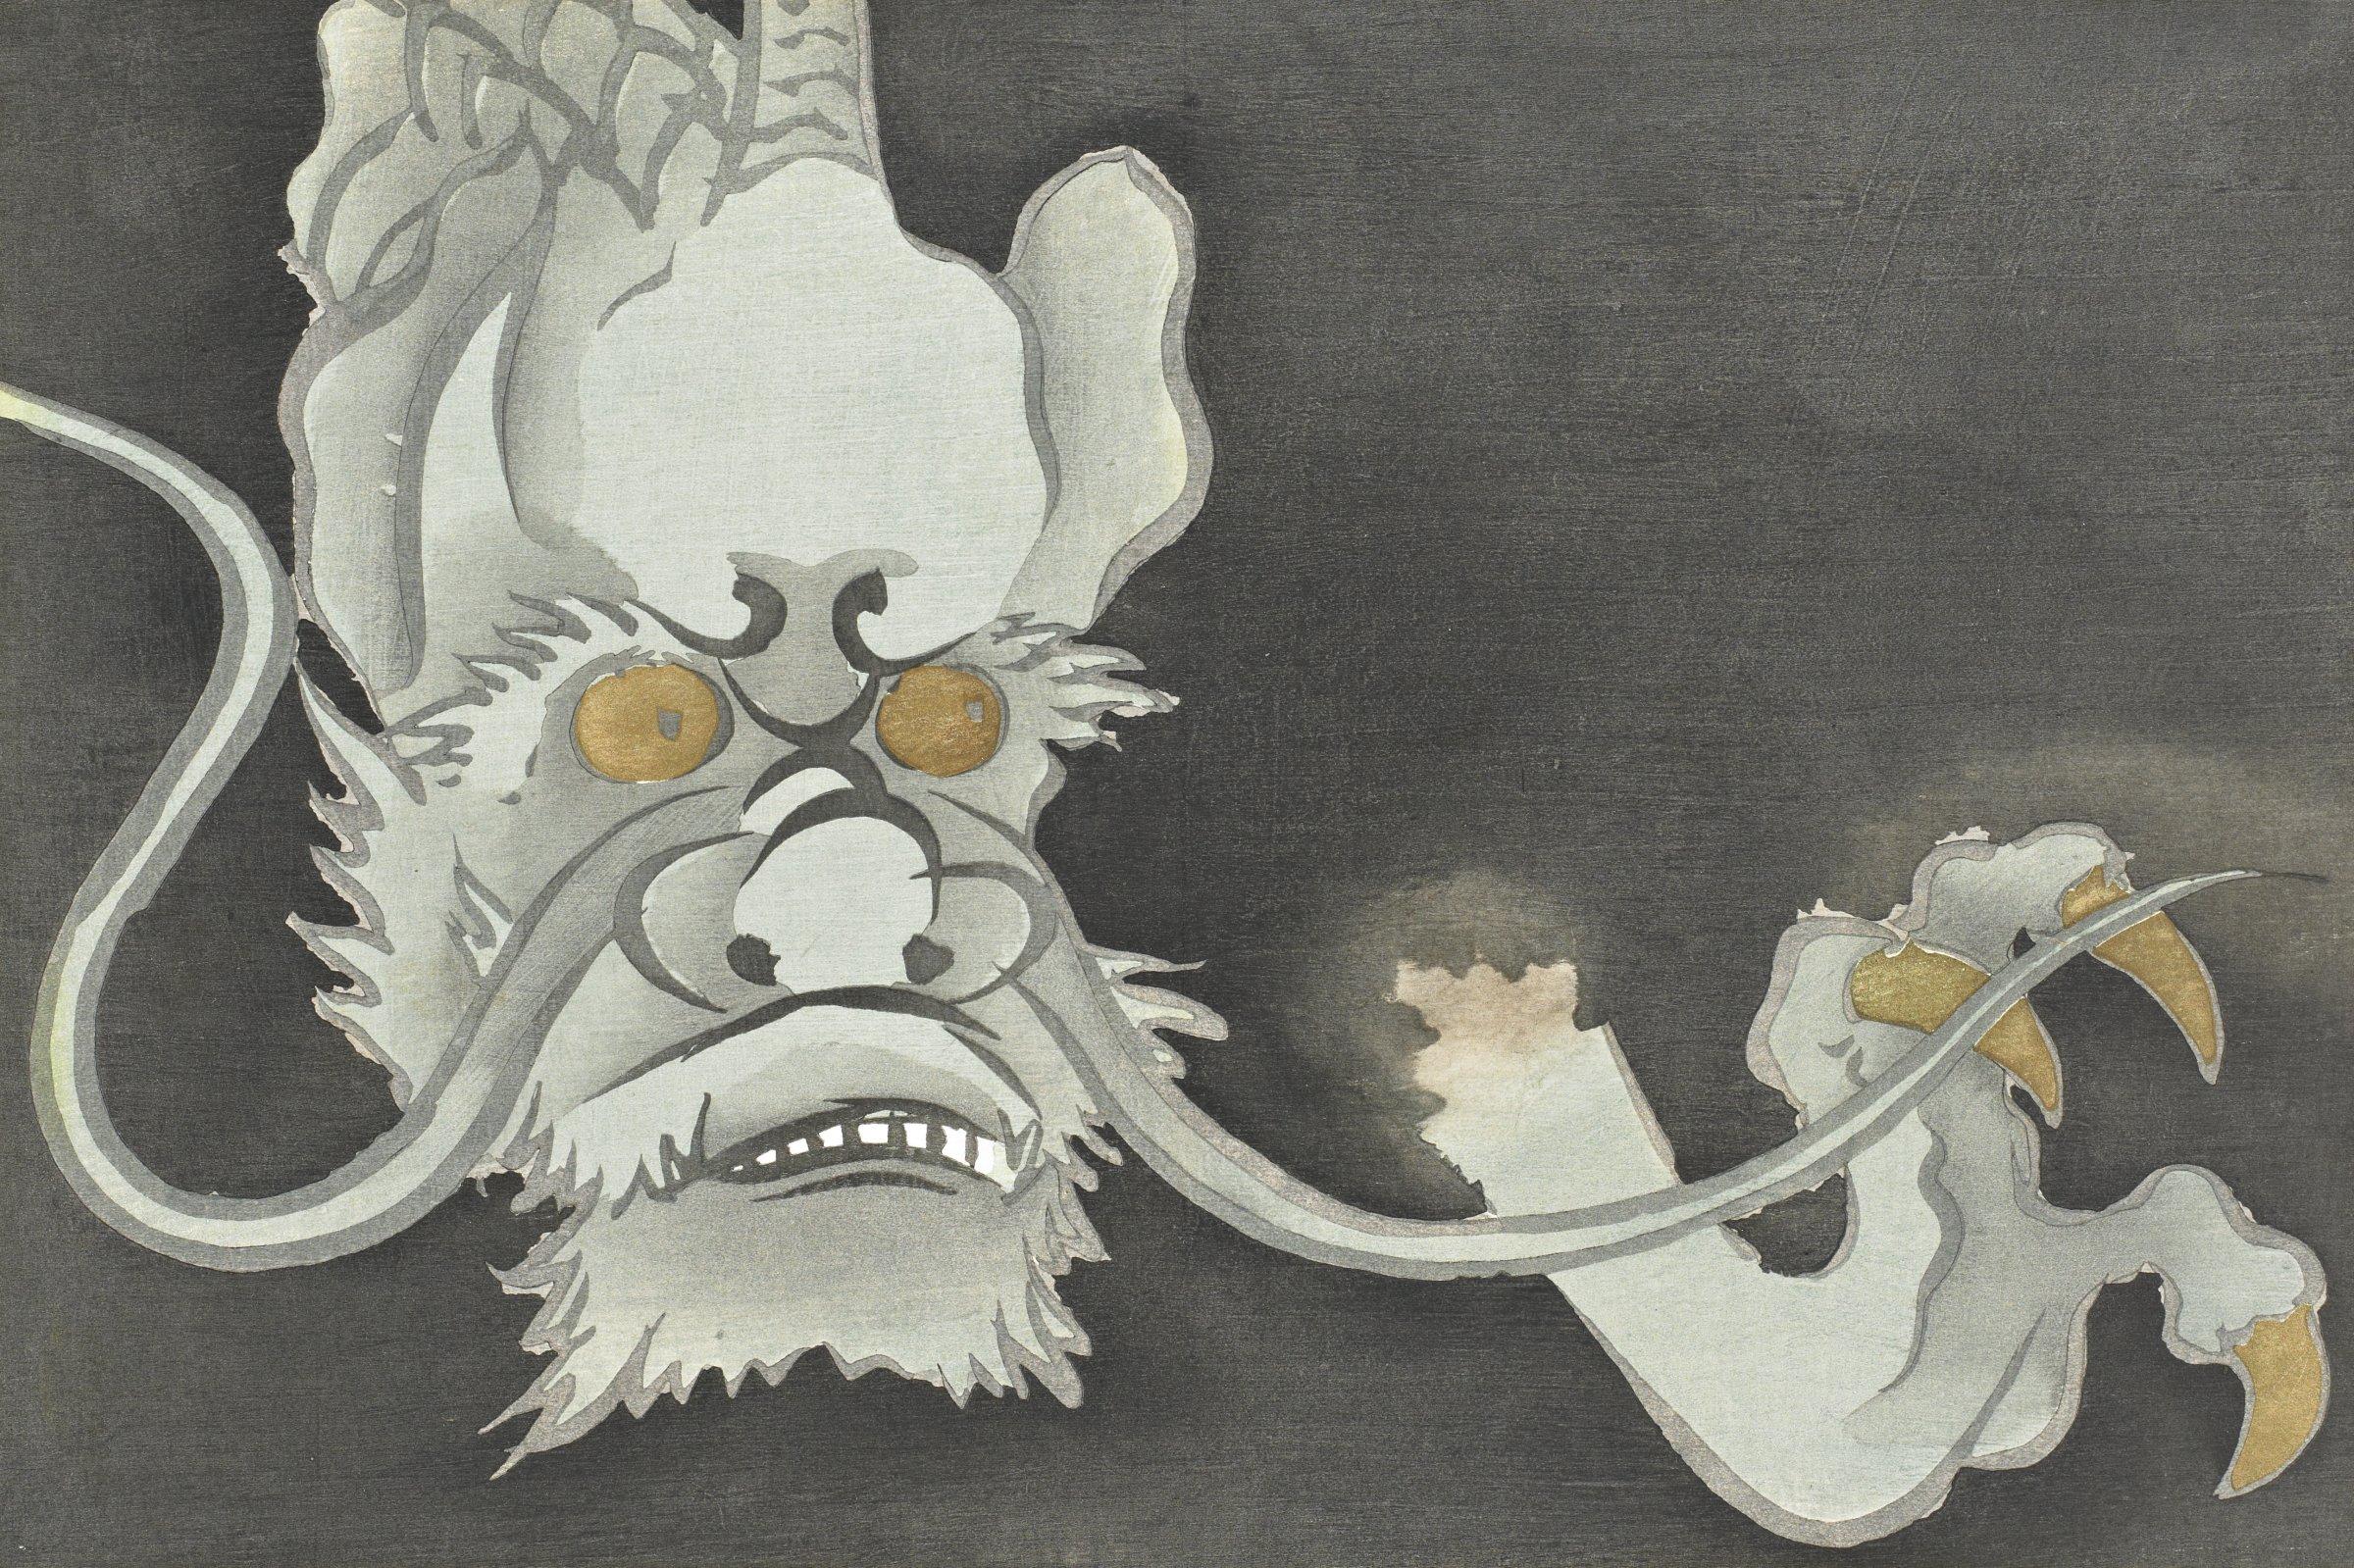 Ryu (Dragon), from Momoyogusa (A World of Things), Volume 3, Kamisaka Sekka, ink and color on paper